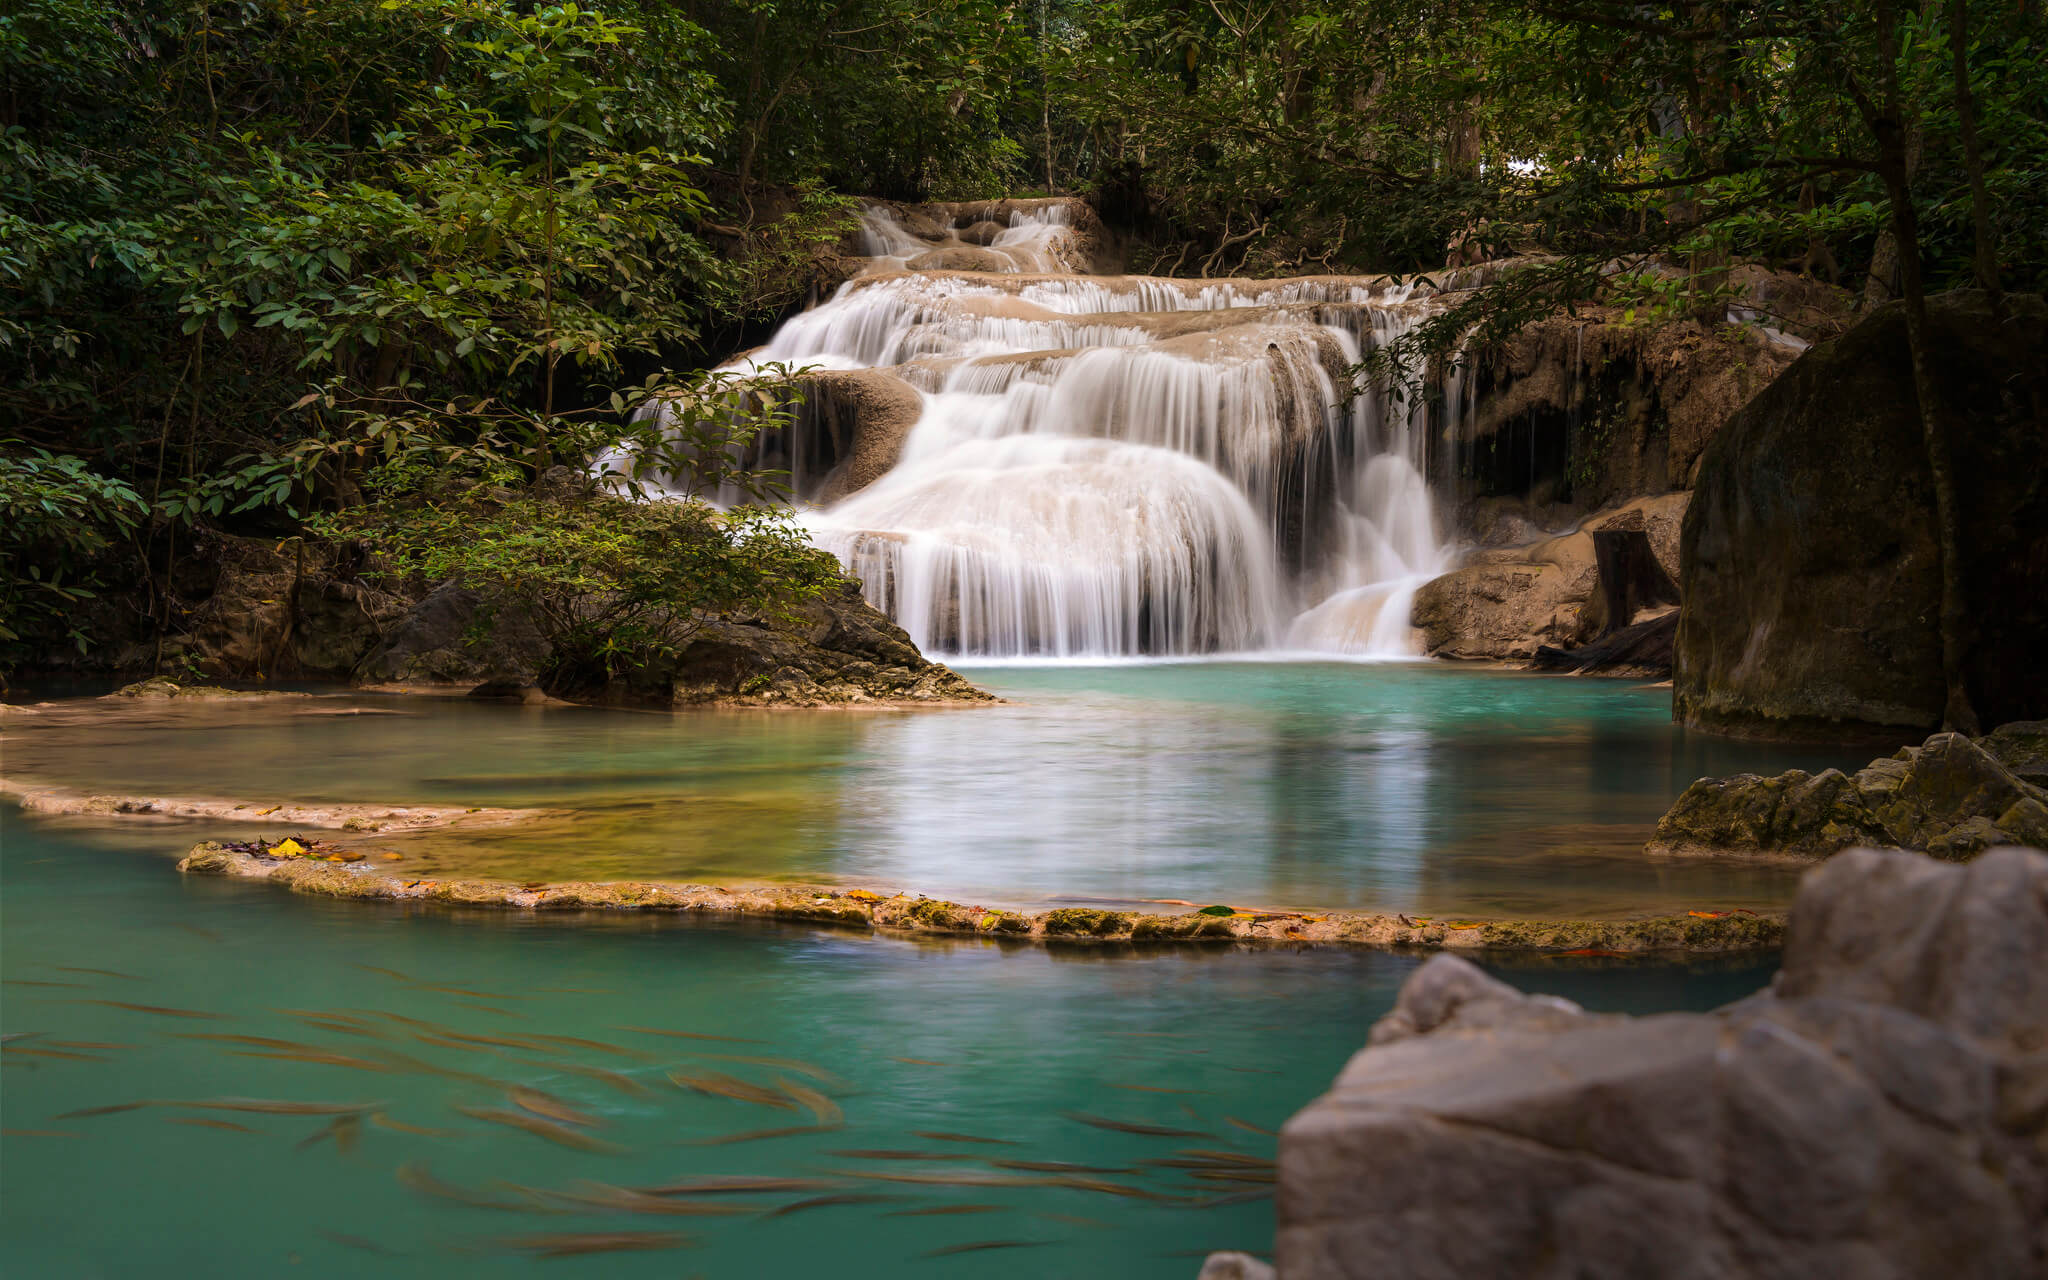 Таиланд, город Канчанабури, национальный парк Эраван, водопад.